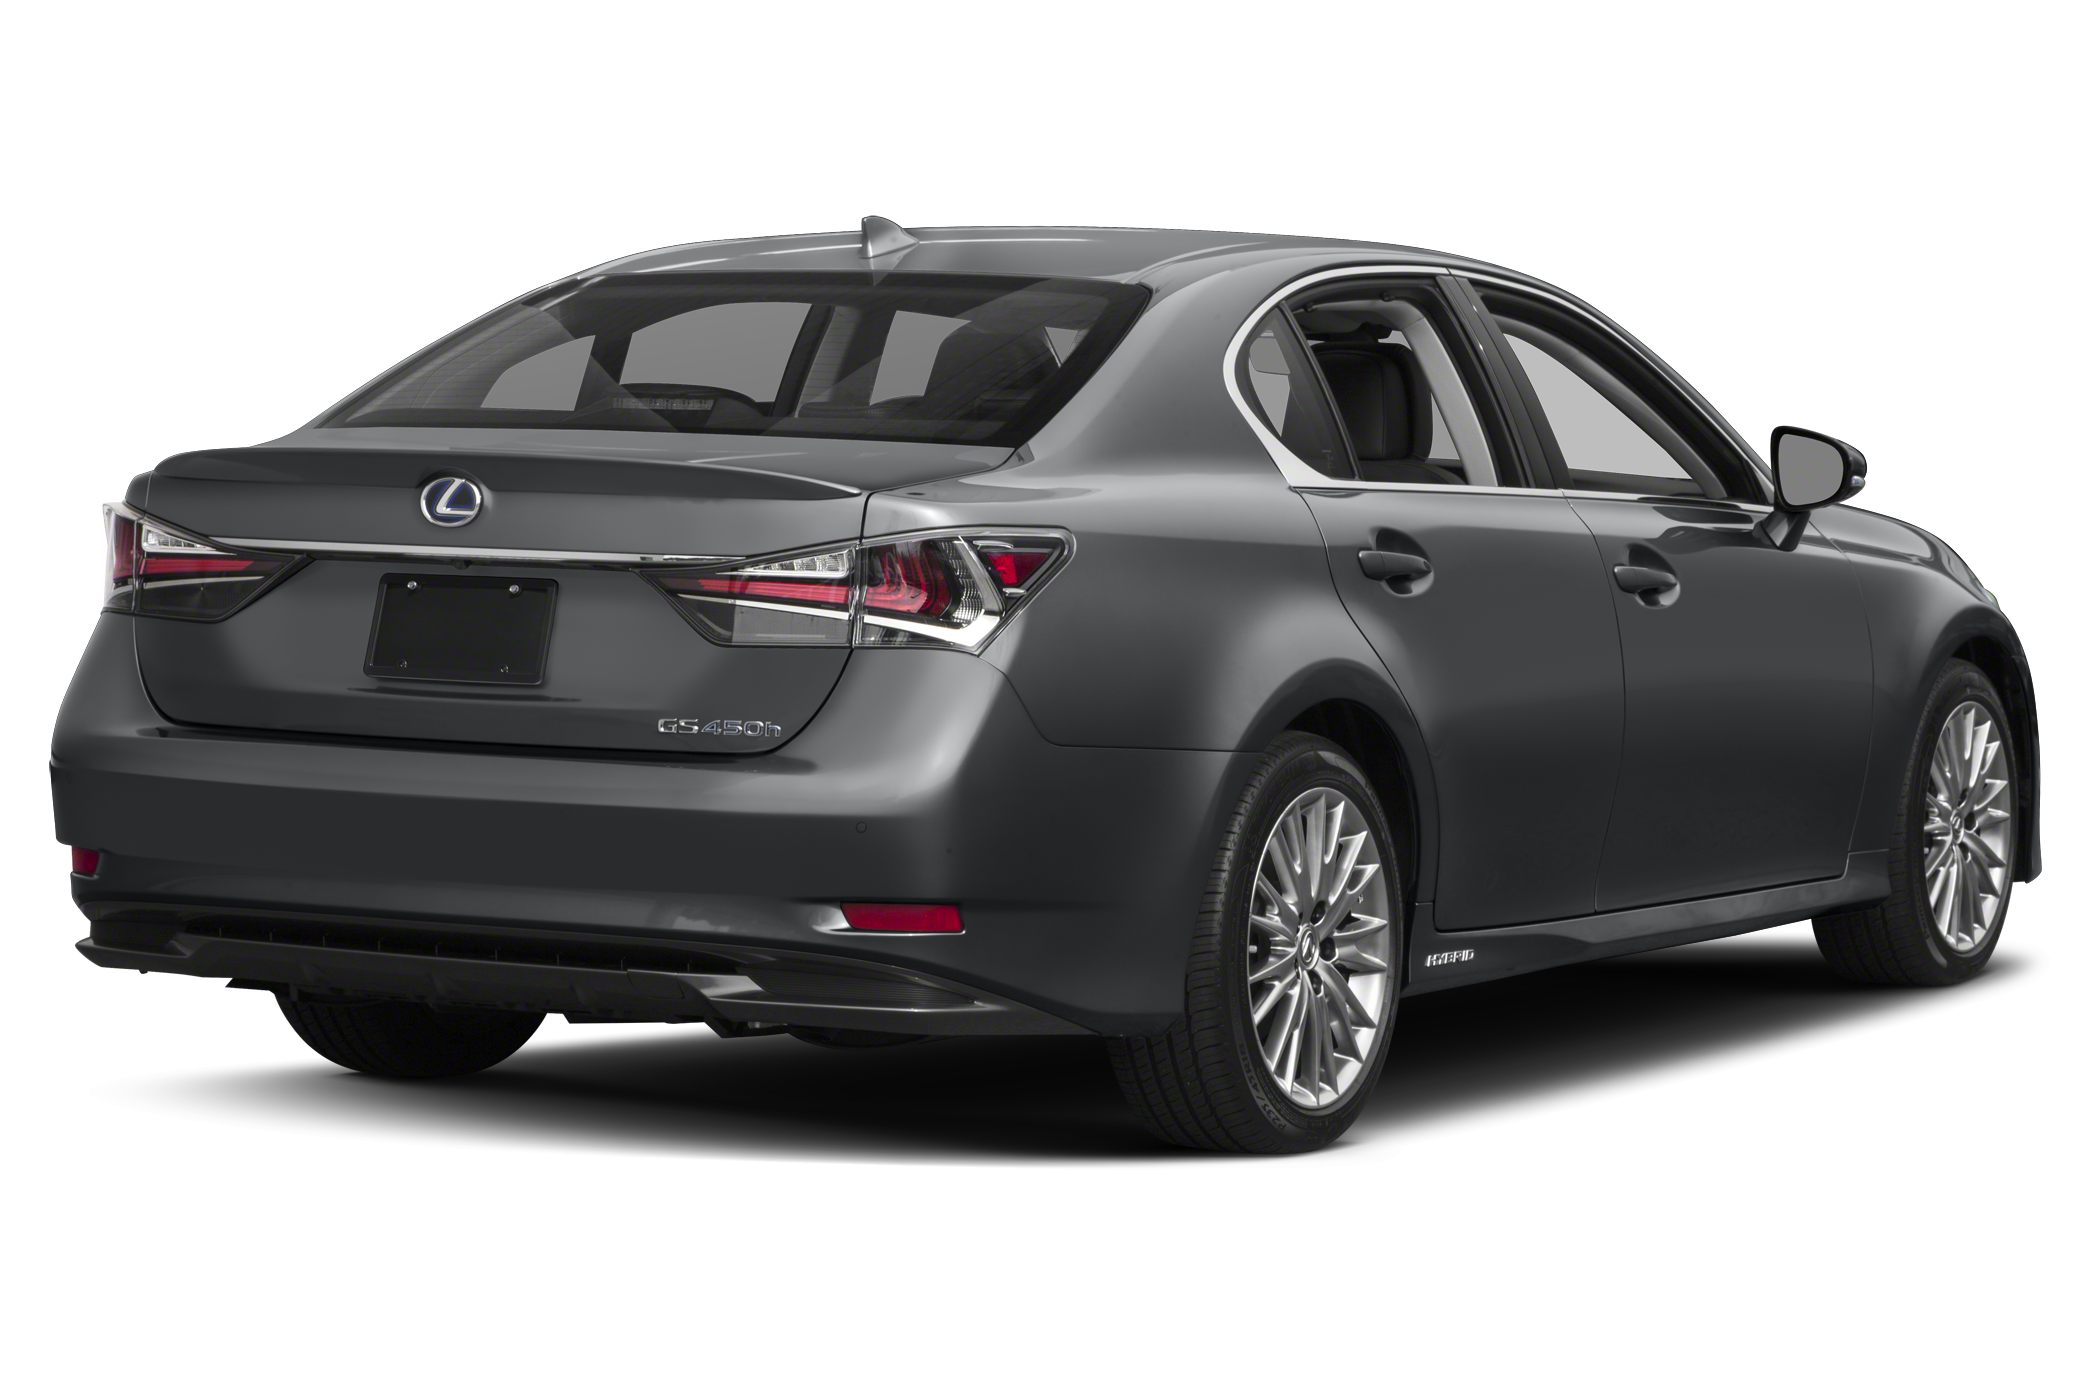 2018 Lexus GS 450h for sale in Toronto Ken Shaw Lexus